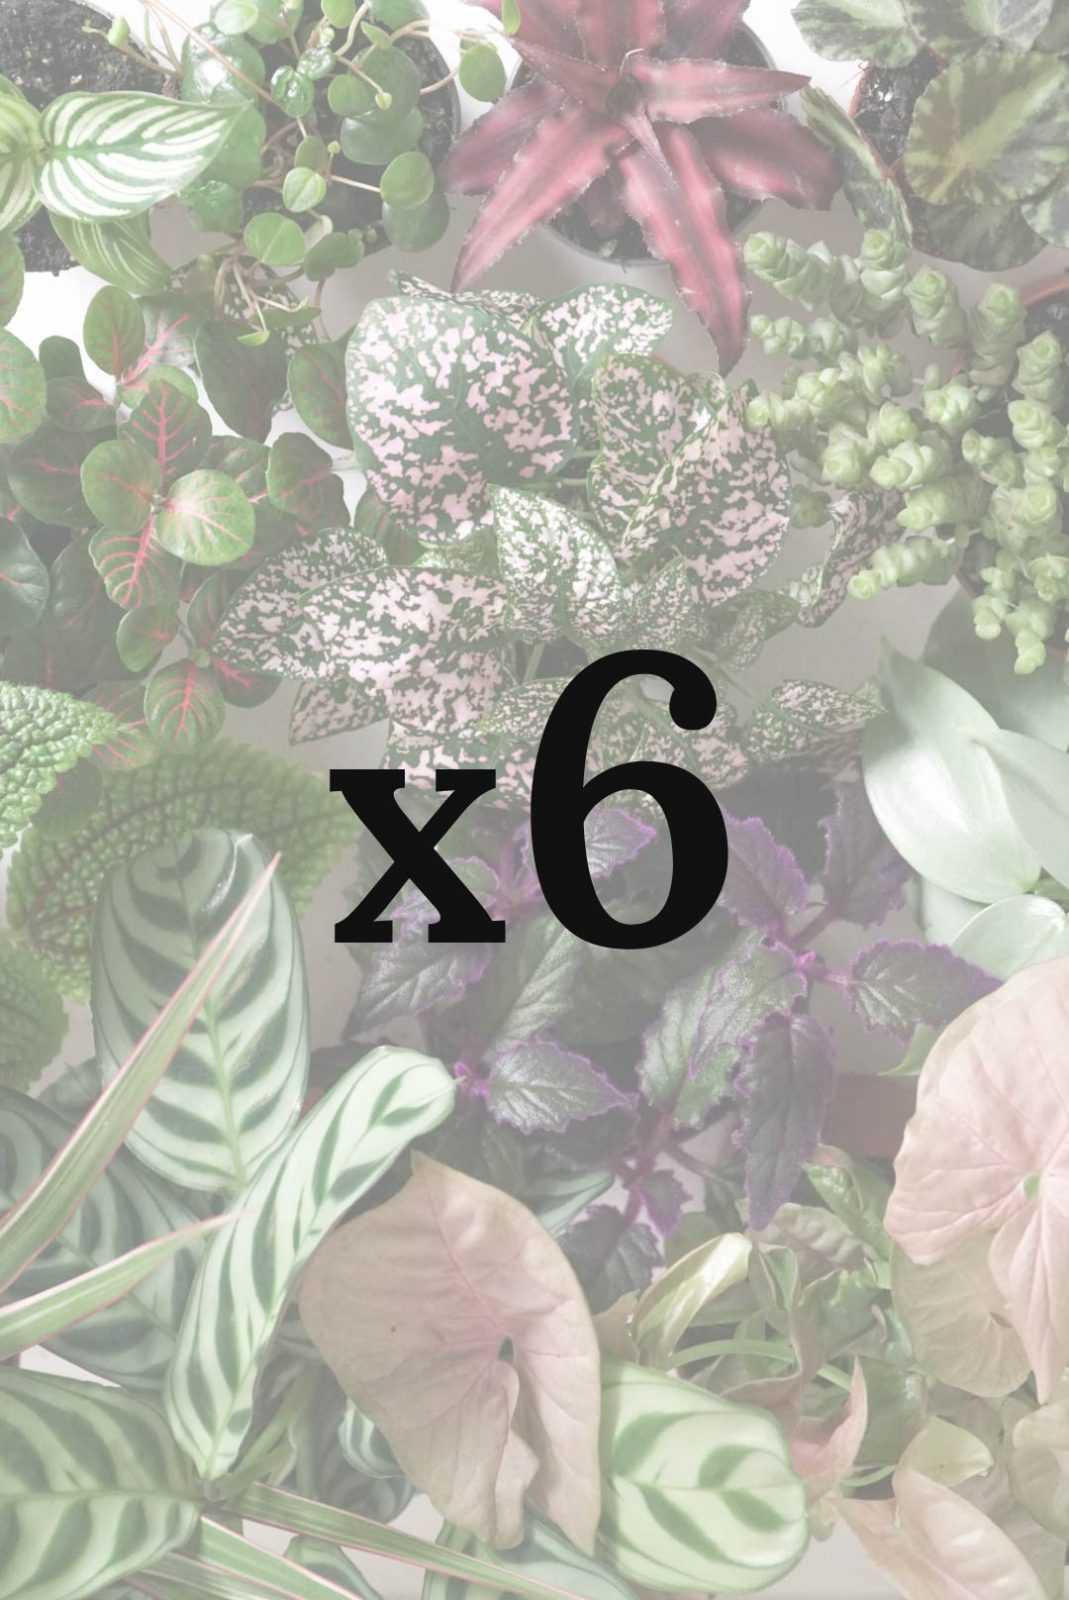 Plantenbox productafbeelding v01 groot